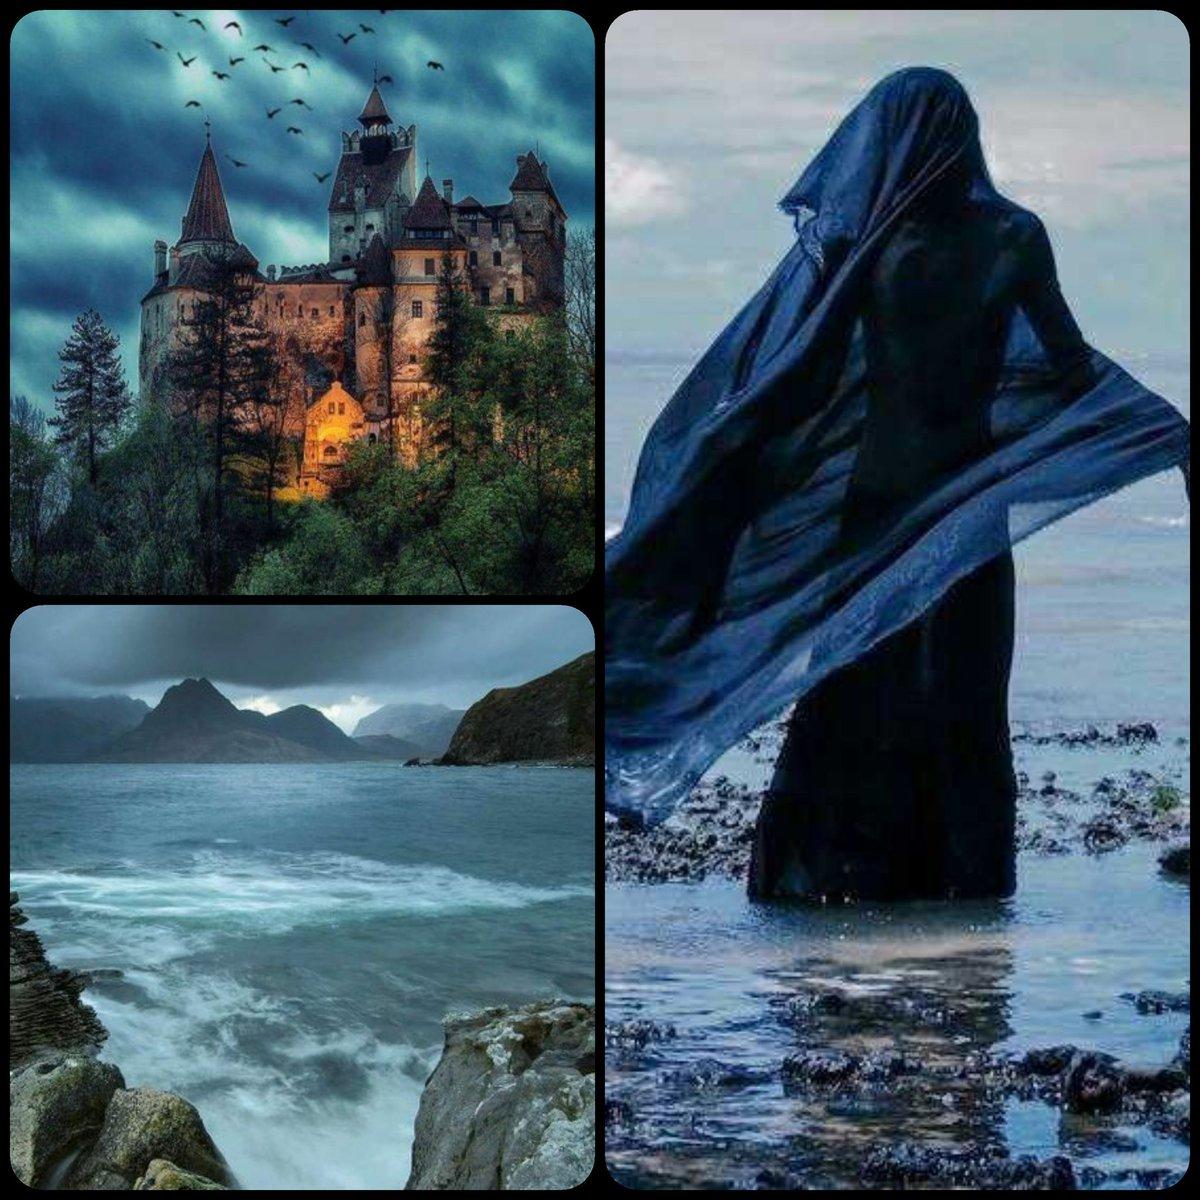 Need Romance, Adventure, Mystery...#Romance #romancenovels #book #readers #books #historicalromance #gamedev #fantasy #Historical #coffee<br>http://pic.twitter.com/v6RkgaiJrp